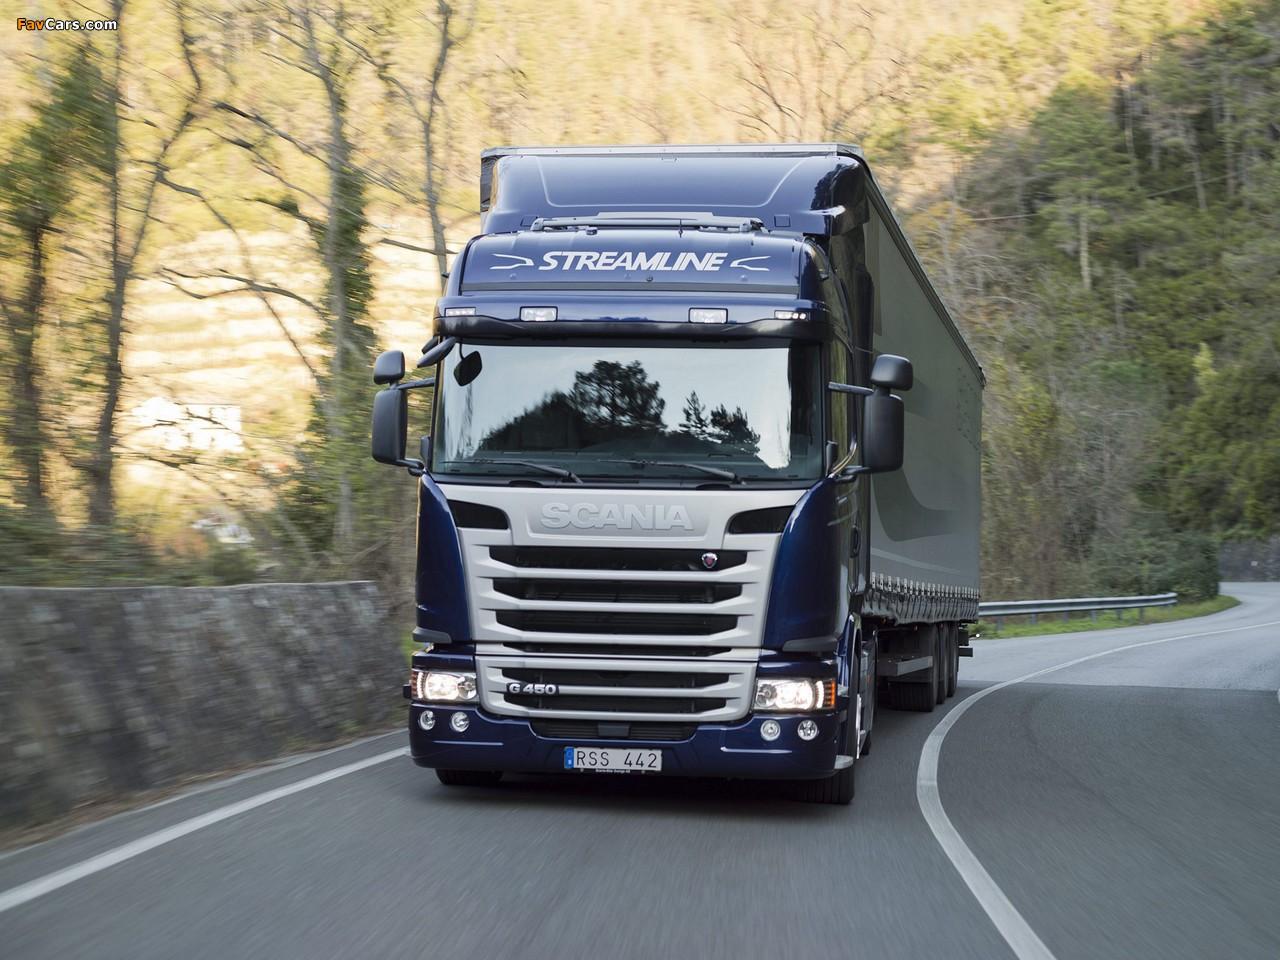 Scania G450 4x2 Streamline Highline Cab 2013 pictures (1280 x 960)